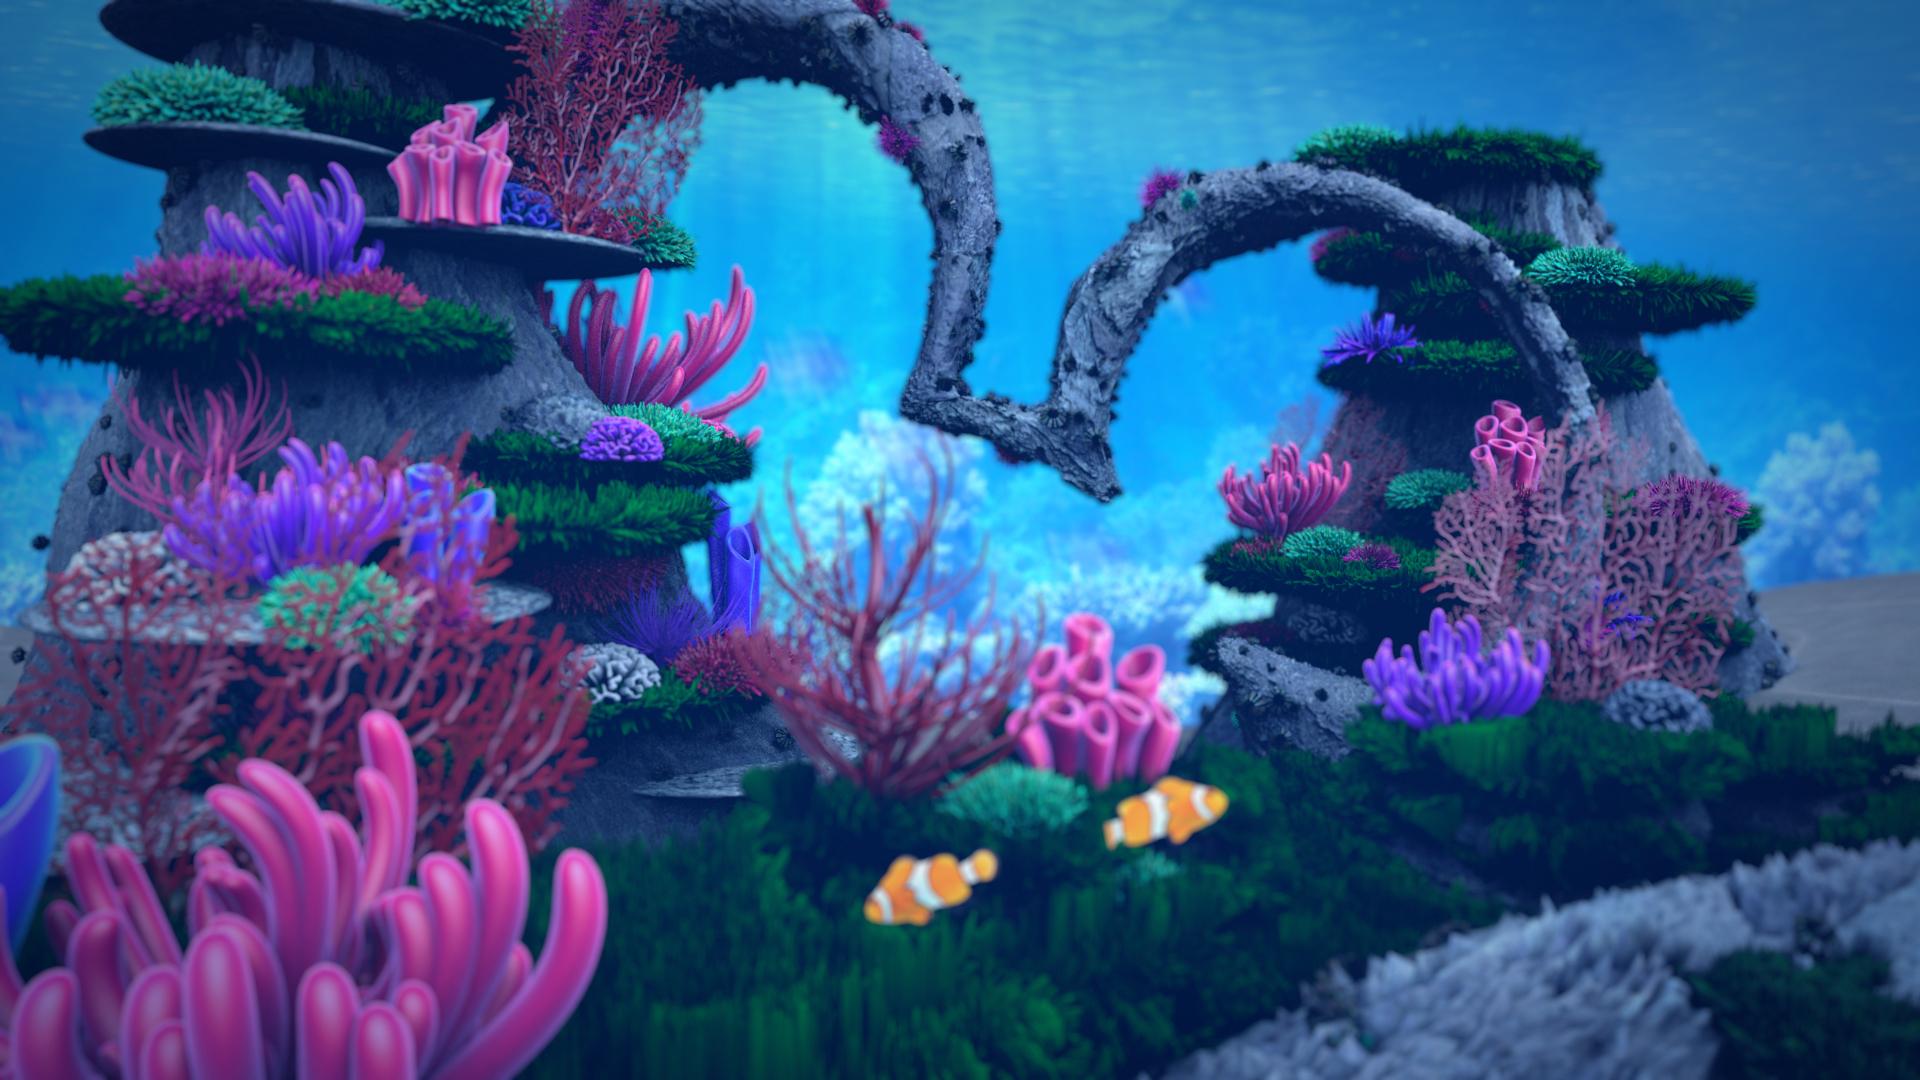 3D_Animation_DisneyMovies.jpg